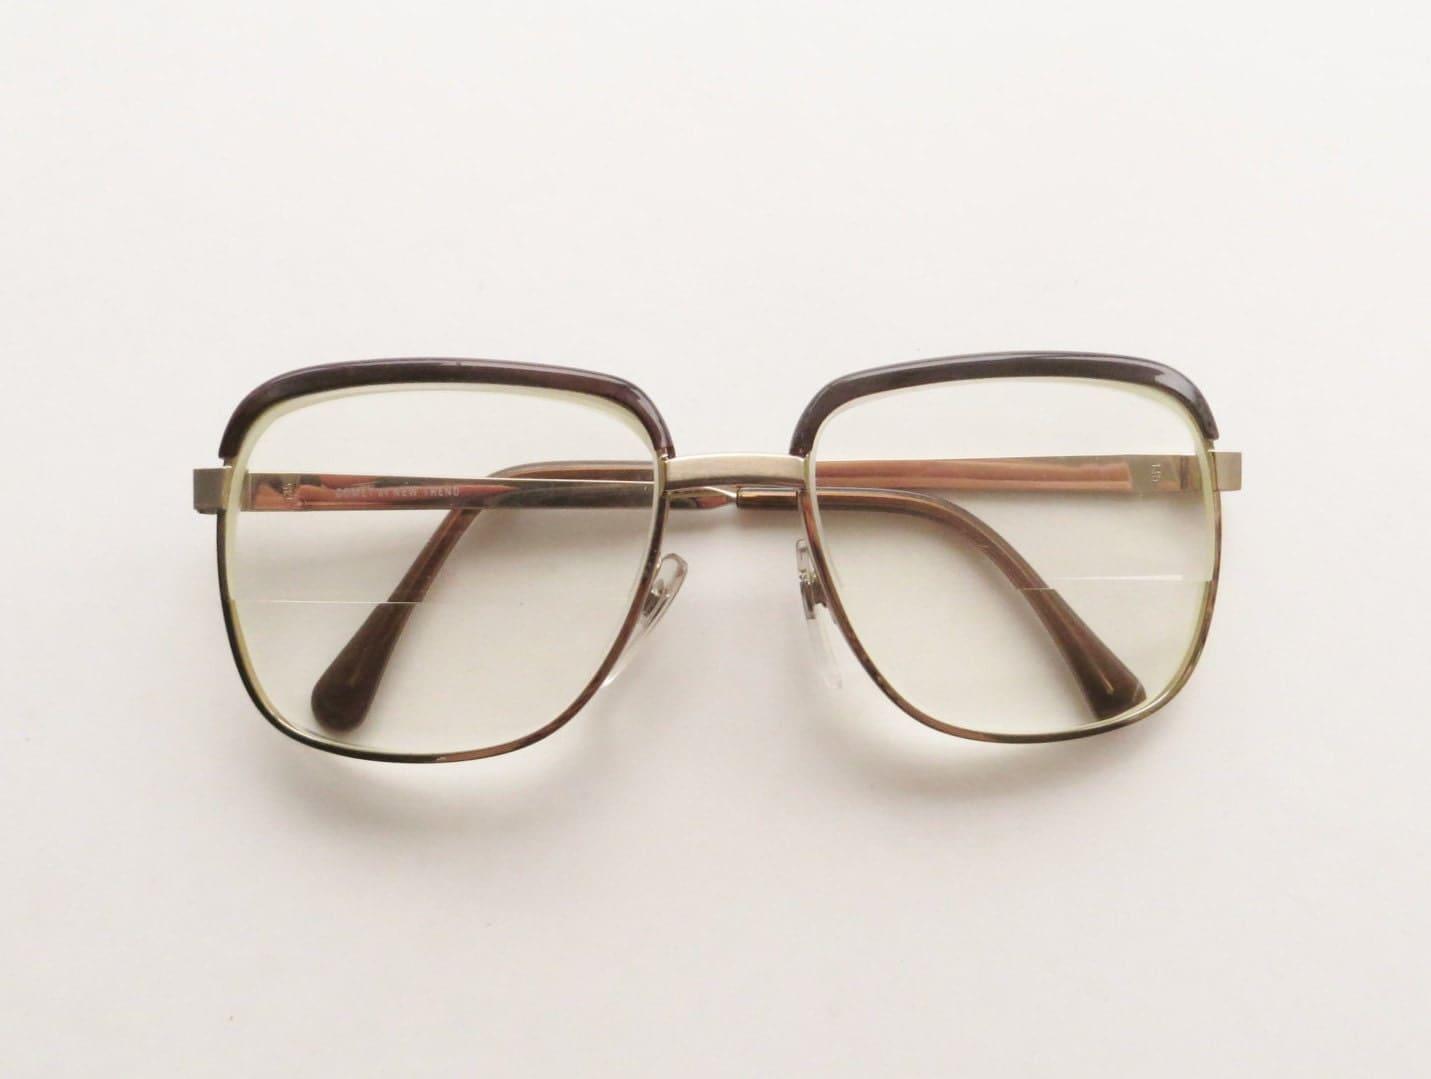 Aviator Eyeglasses Frame : 90s Aviator Eyeglasses Silver Frame with by RuseDreamVintage